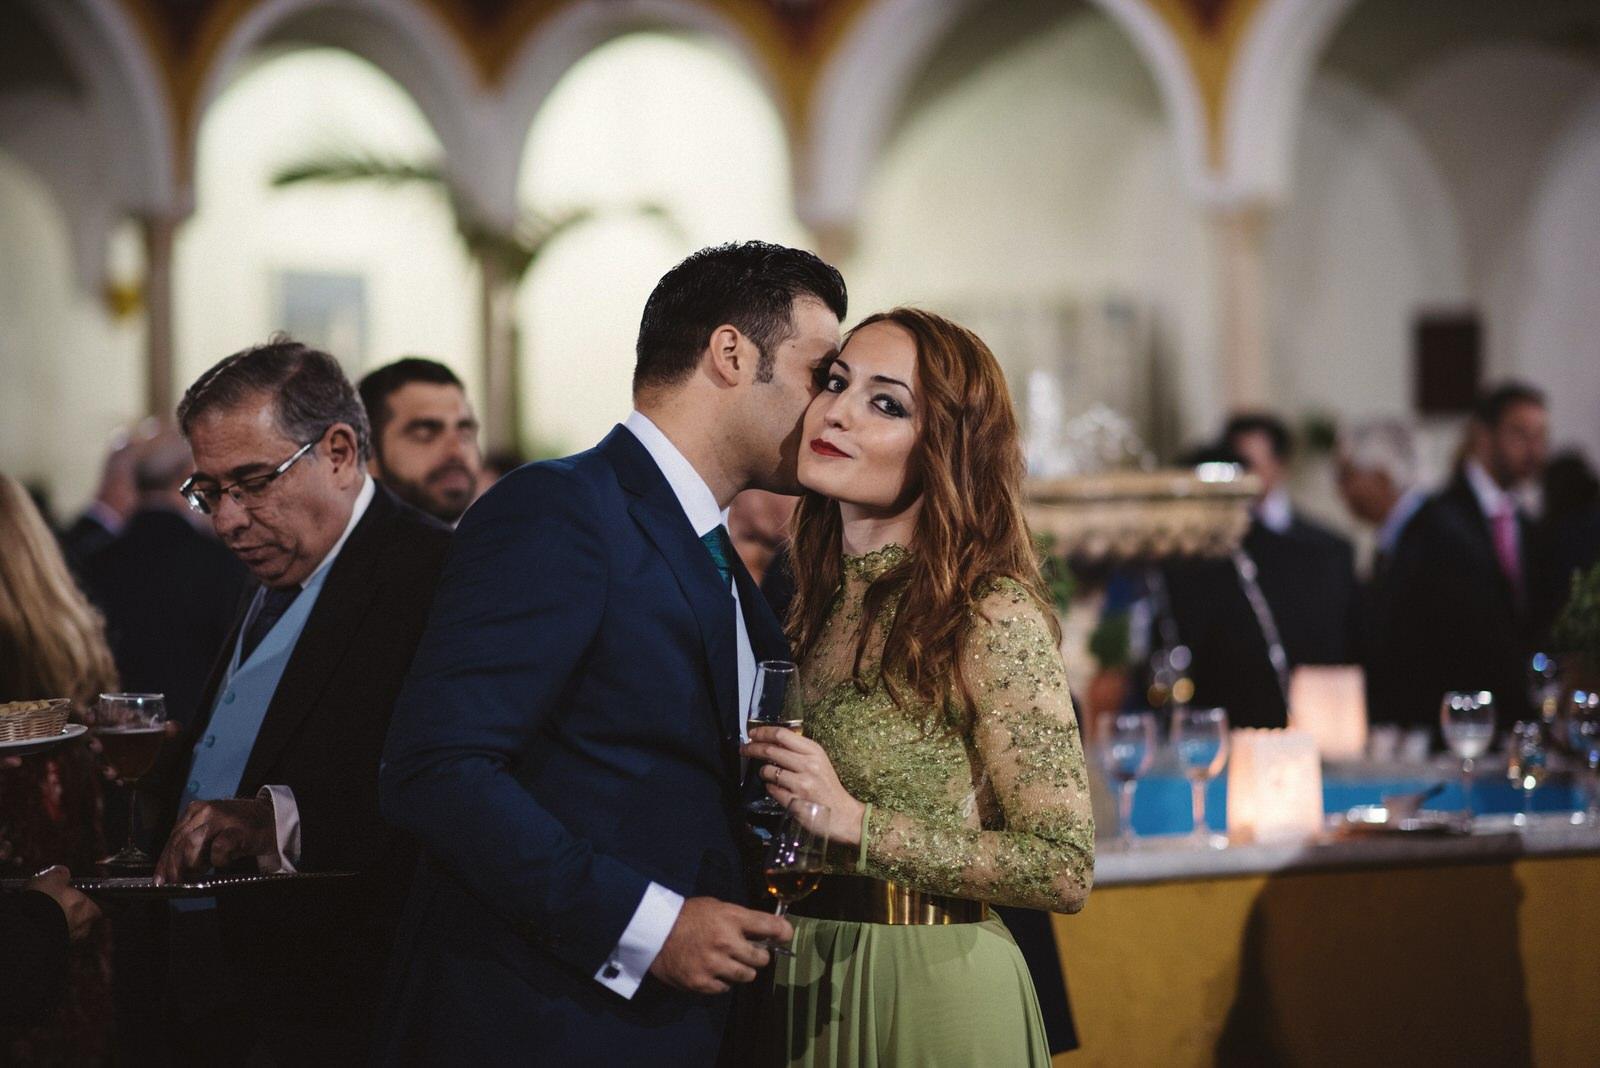 fotografo de bodas sevilla - fotografo boda - fotografía sevilla - Andrés AmarilloAAA_5390- tele- fine.JPG